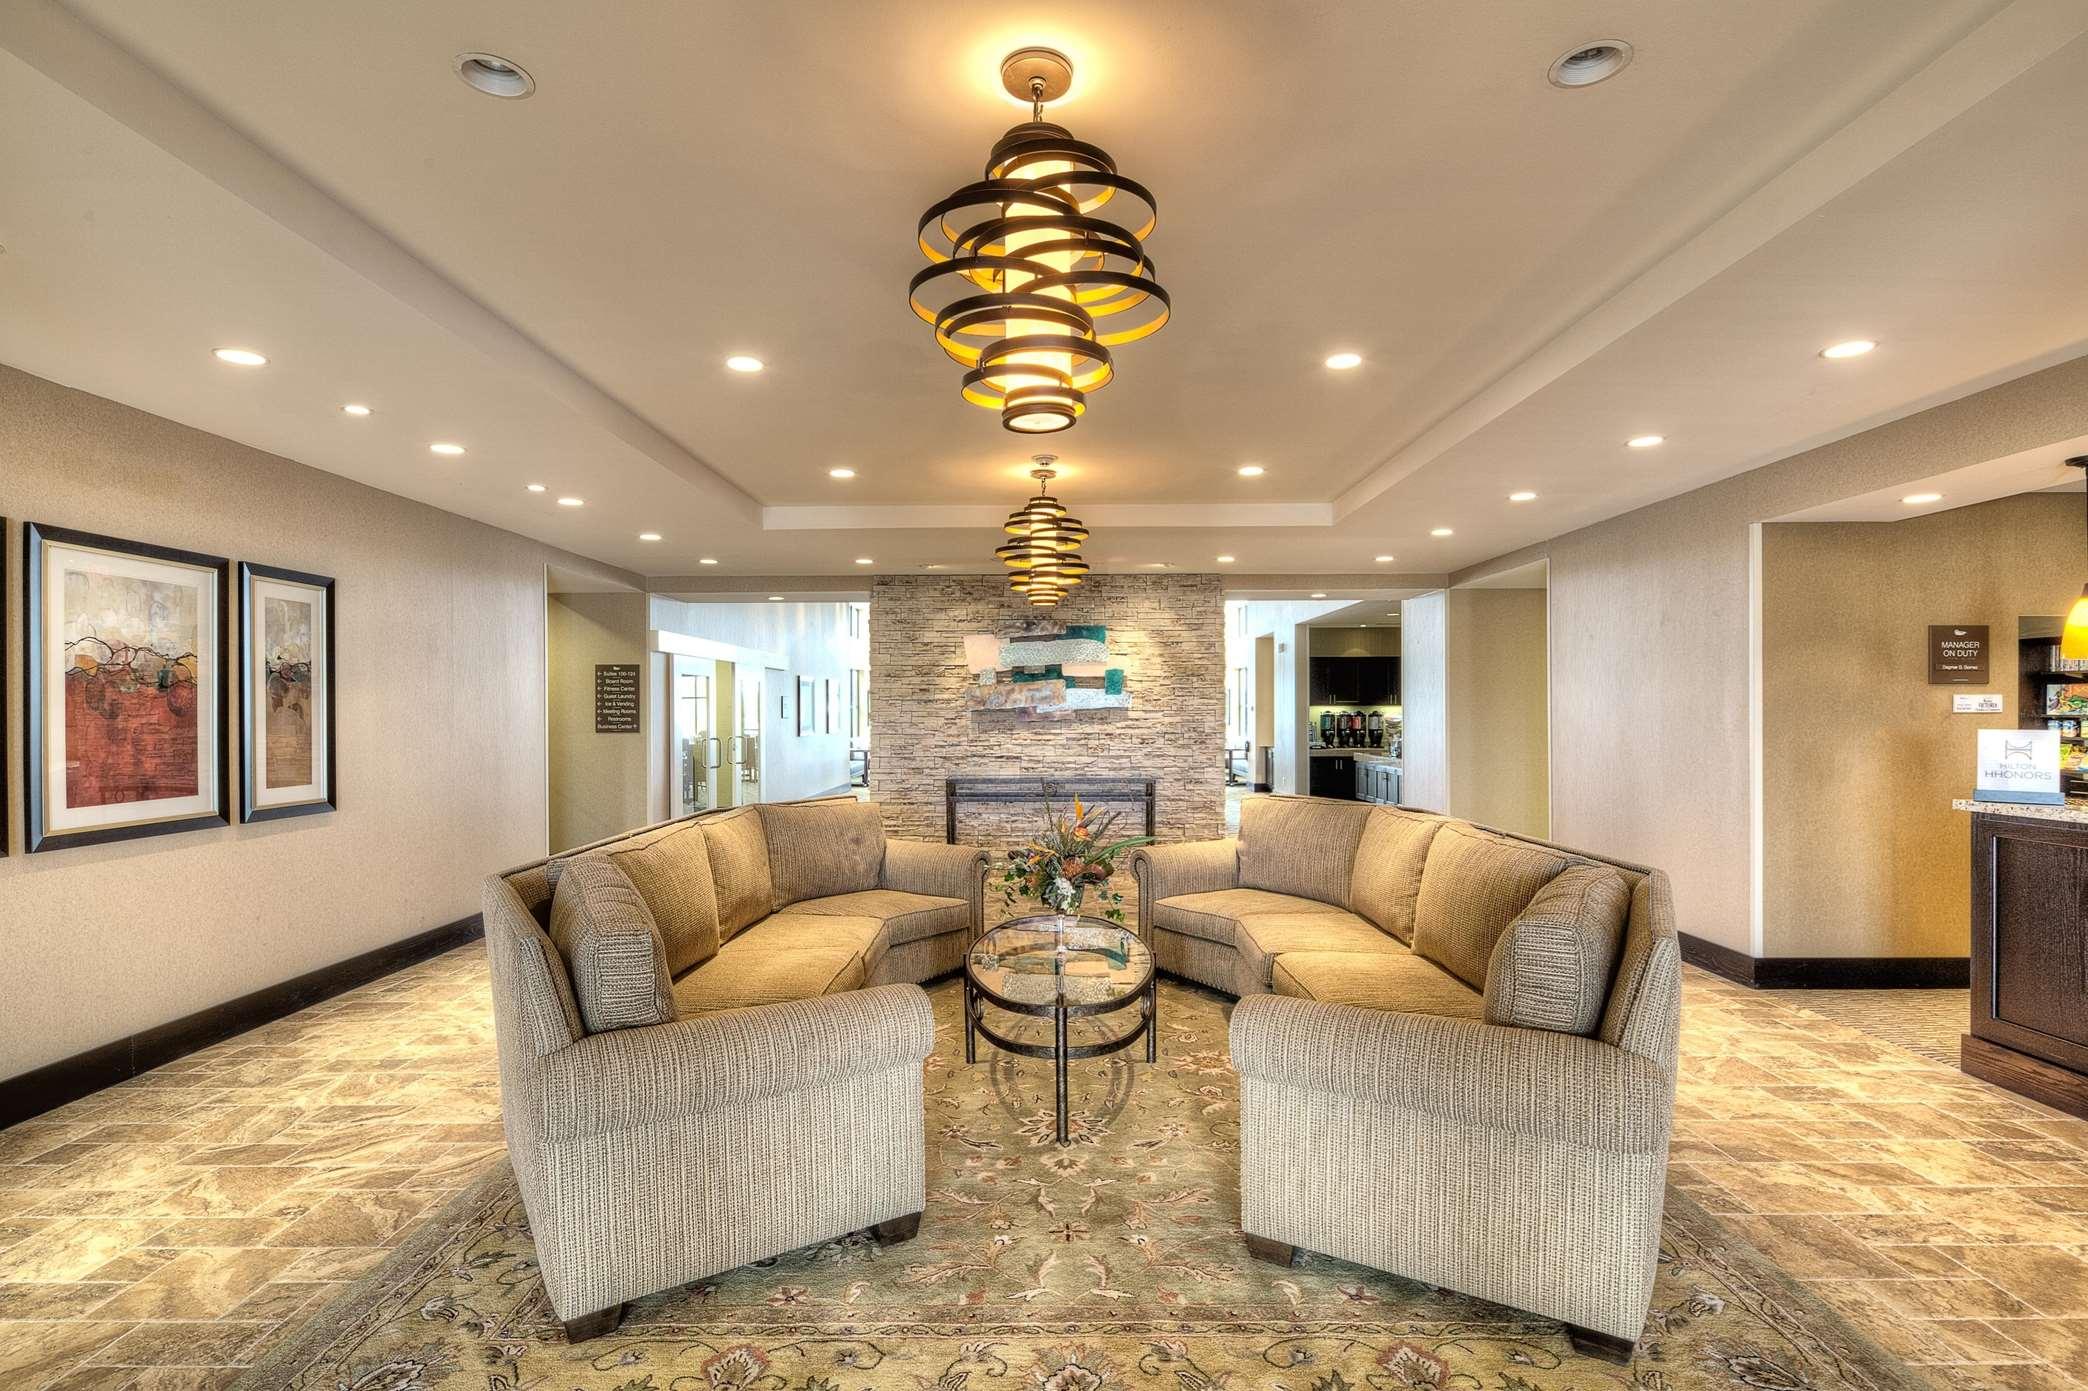 Homewood Suites by Hilton Victoria, TX image 3